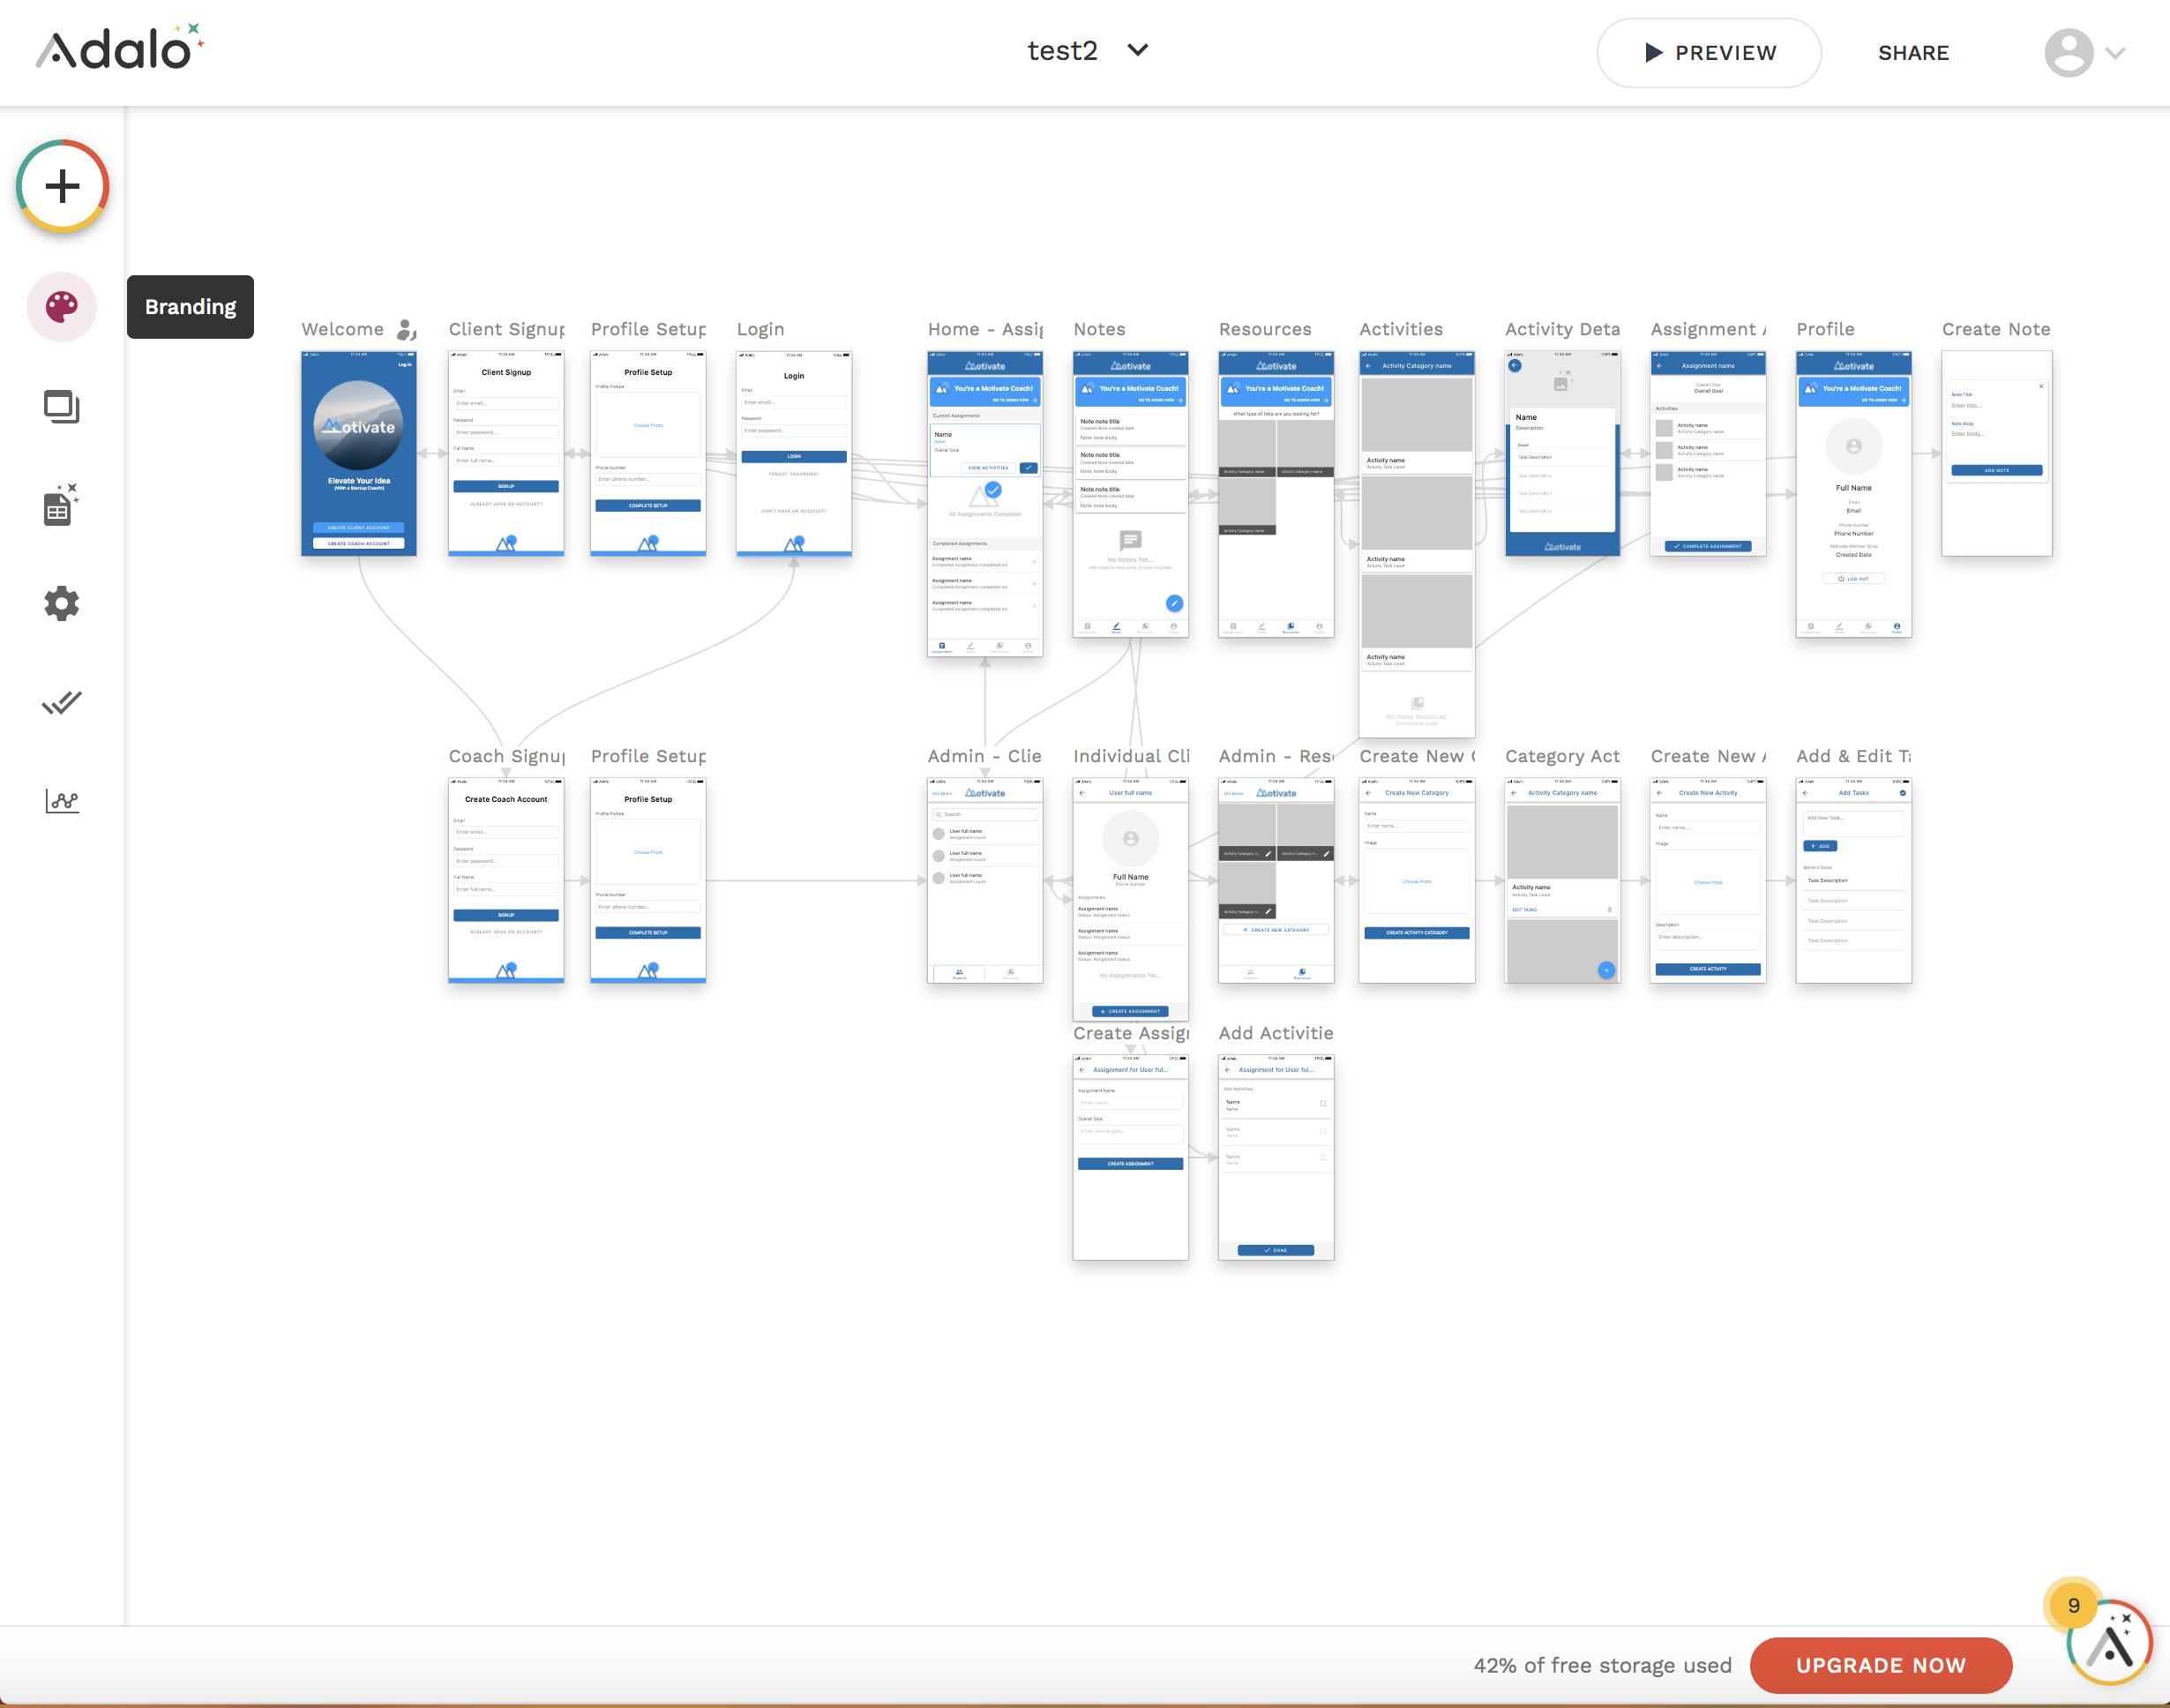 Adaloのアプリ開発画面